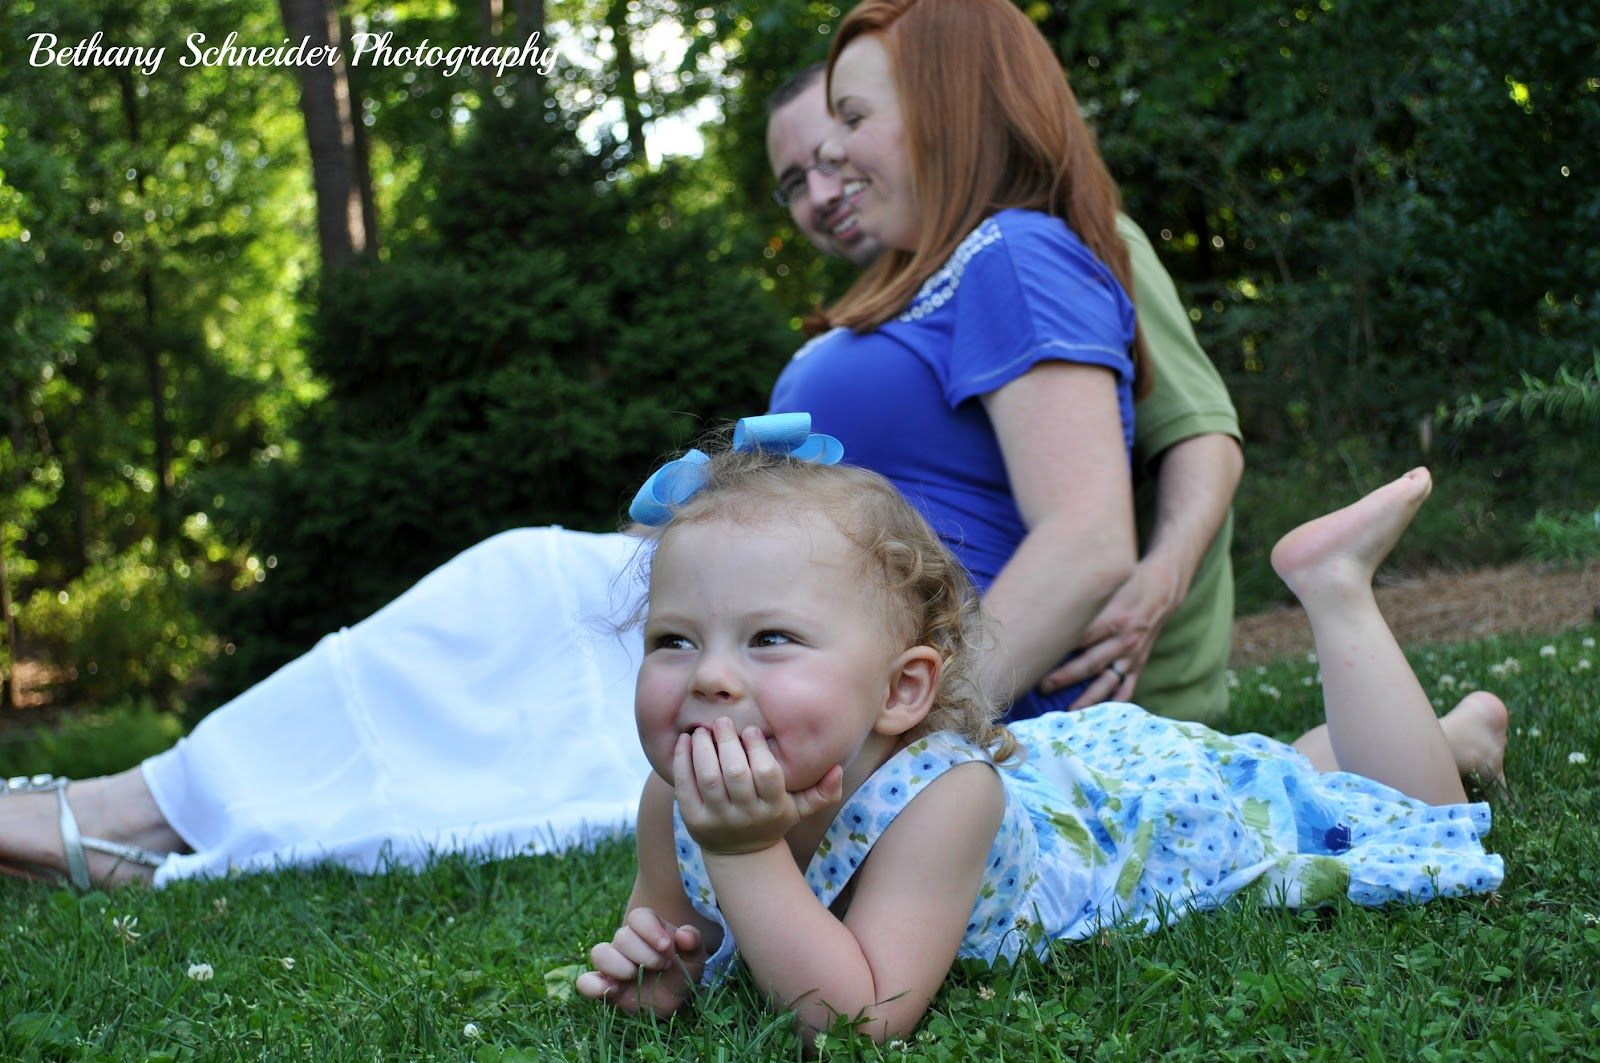 Bethany Schneider Photography: Wells Maternity & Family